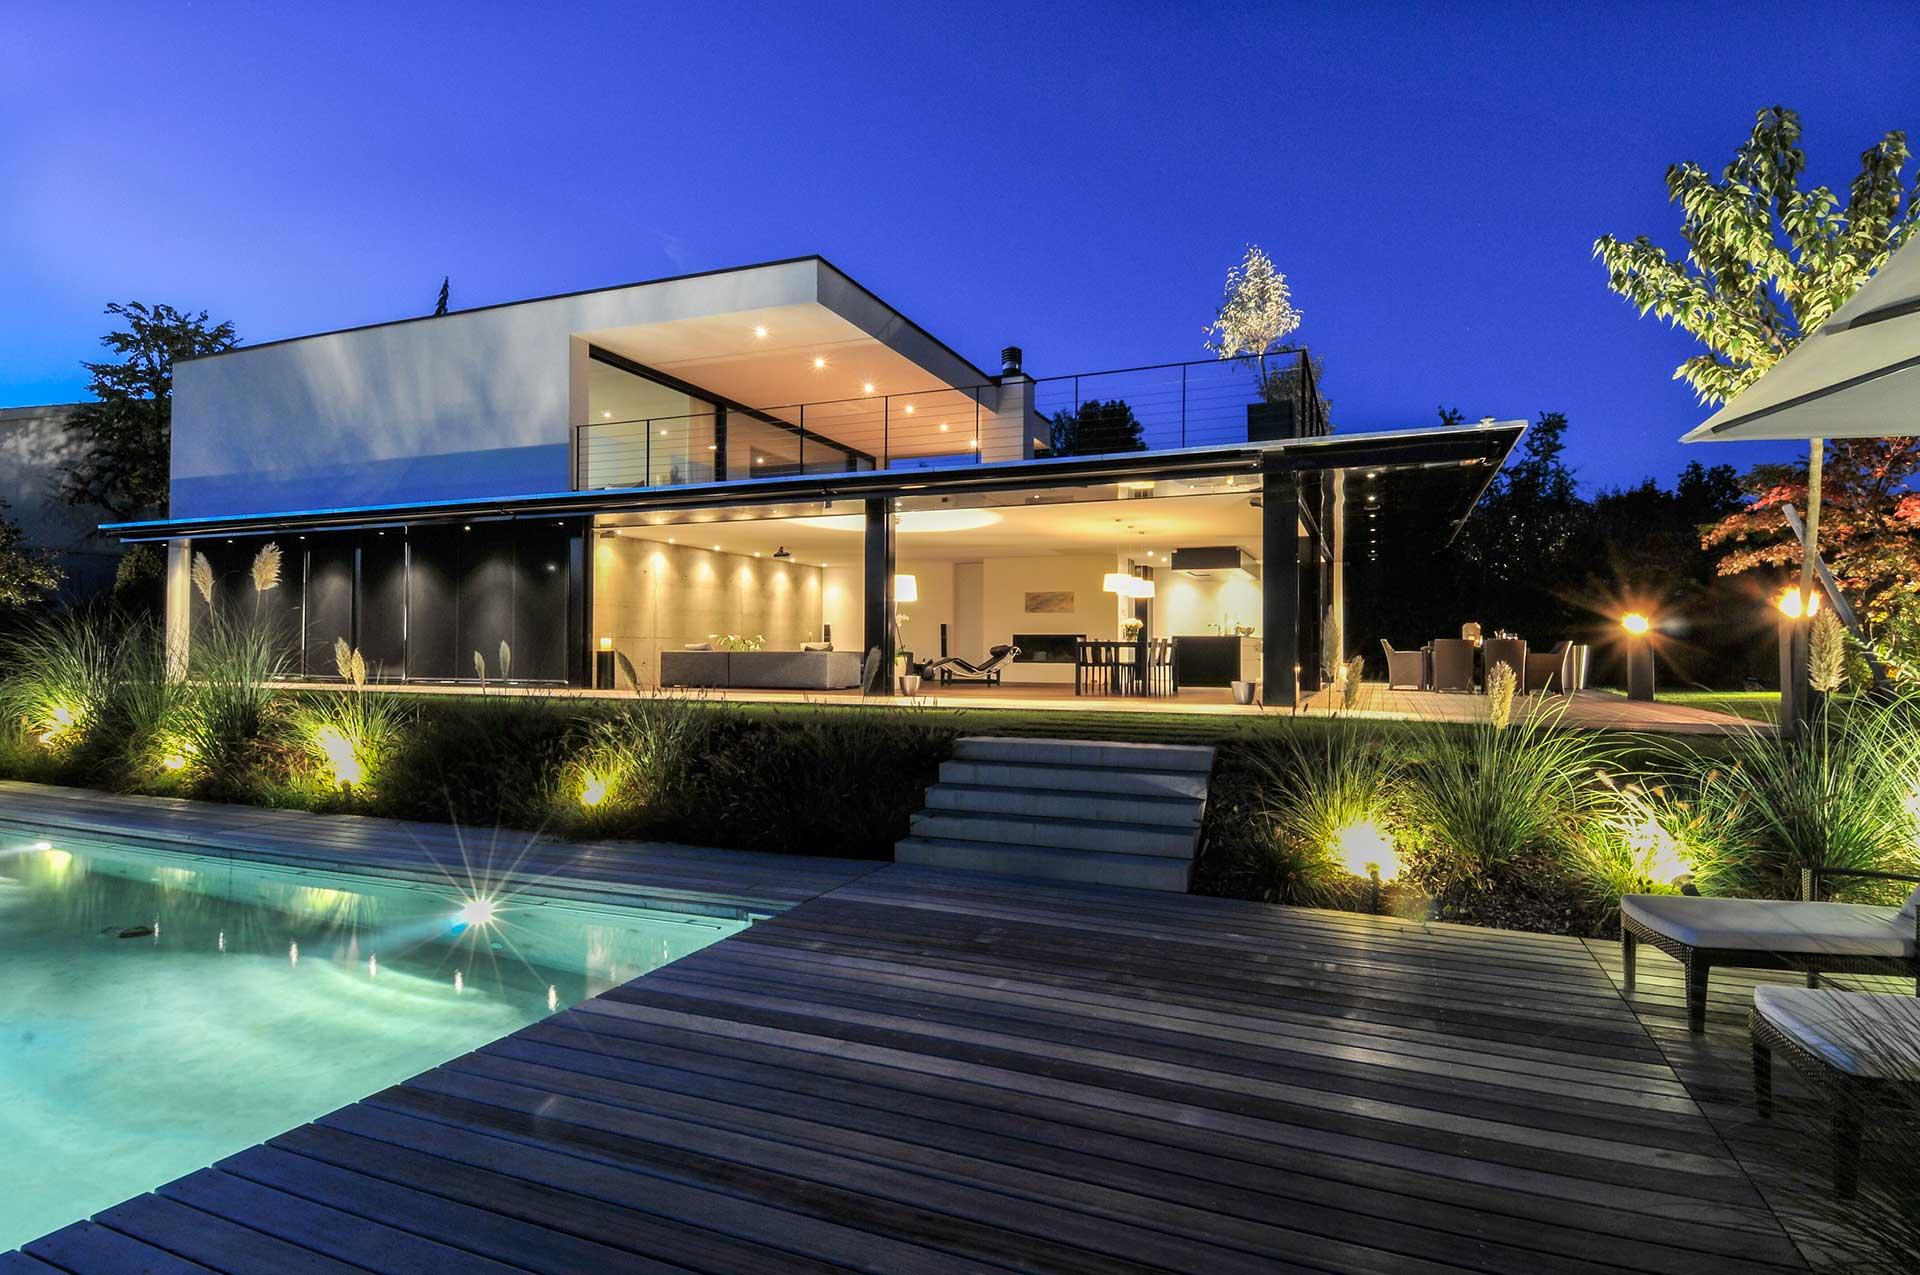 Modern living, modern life, modern building